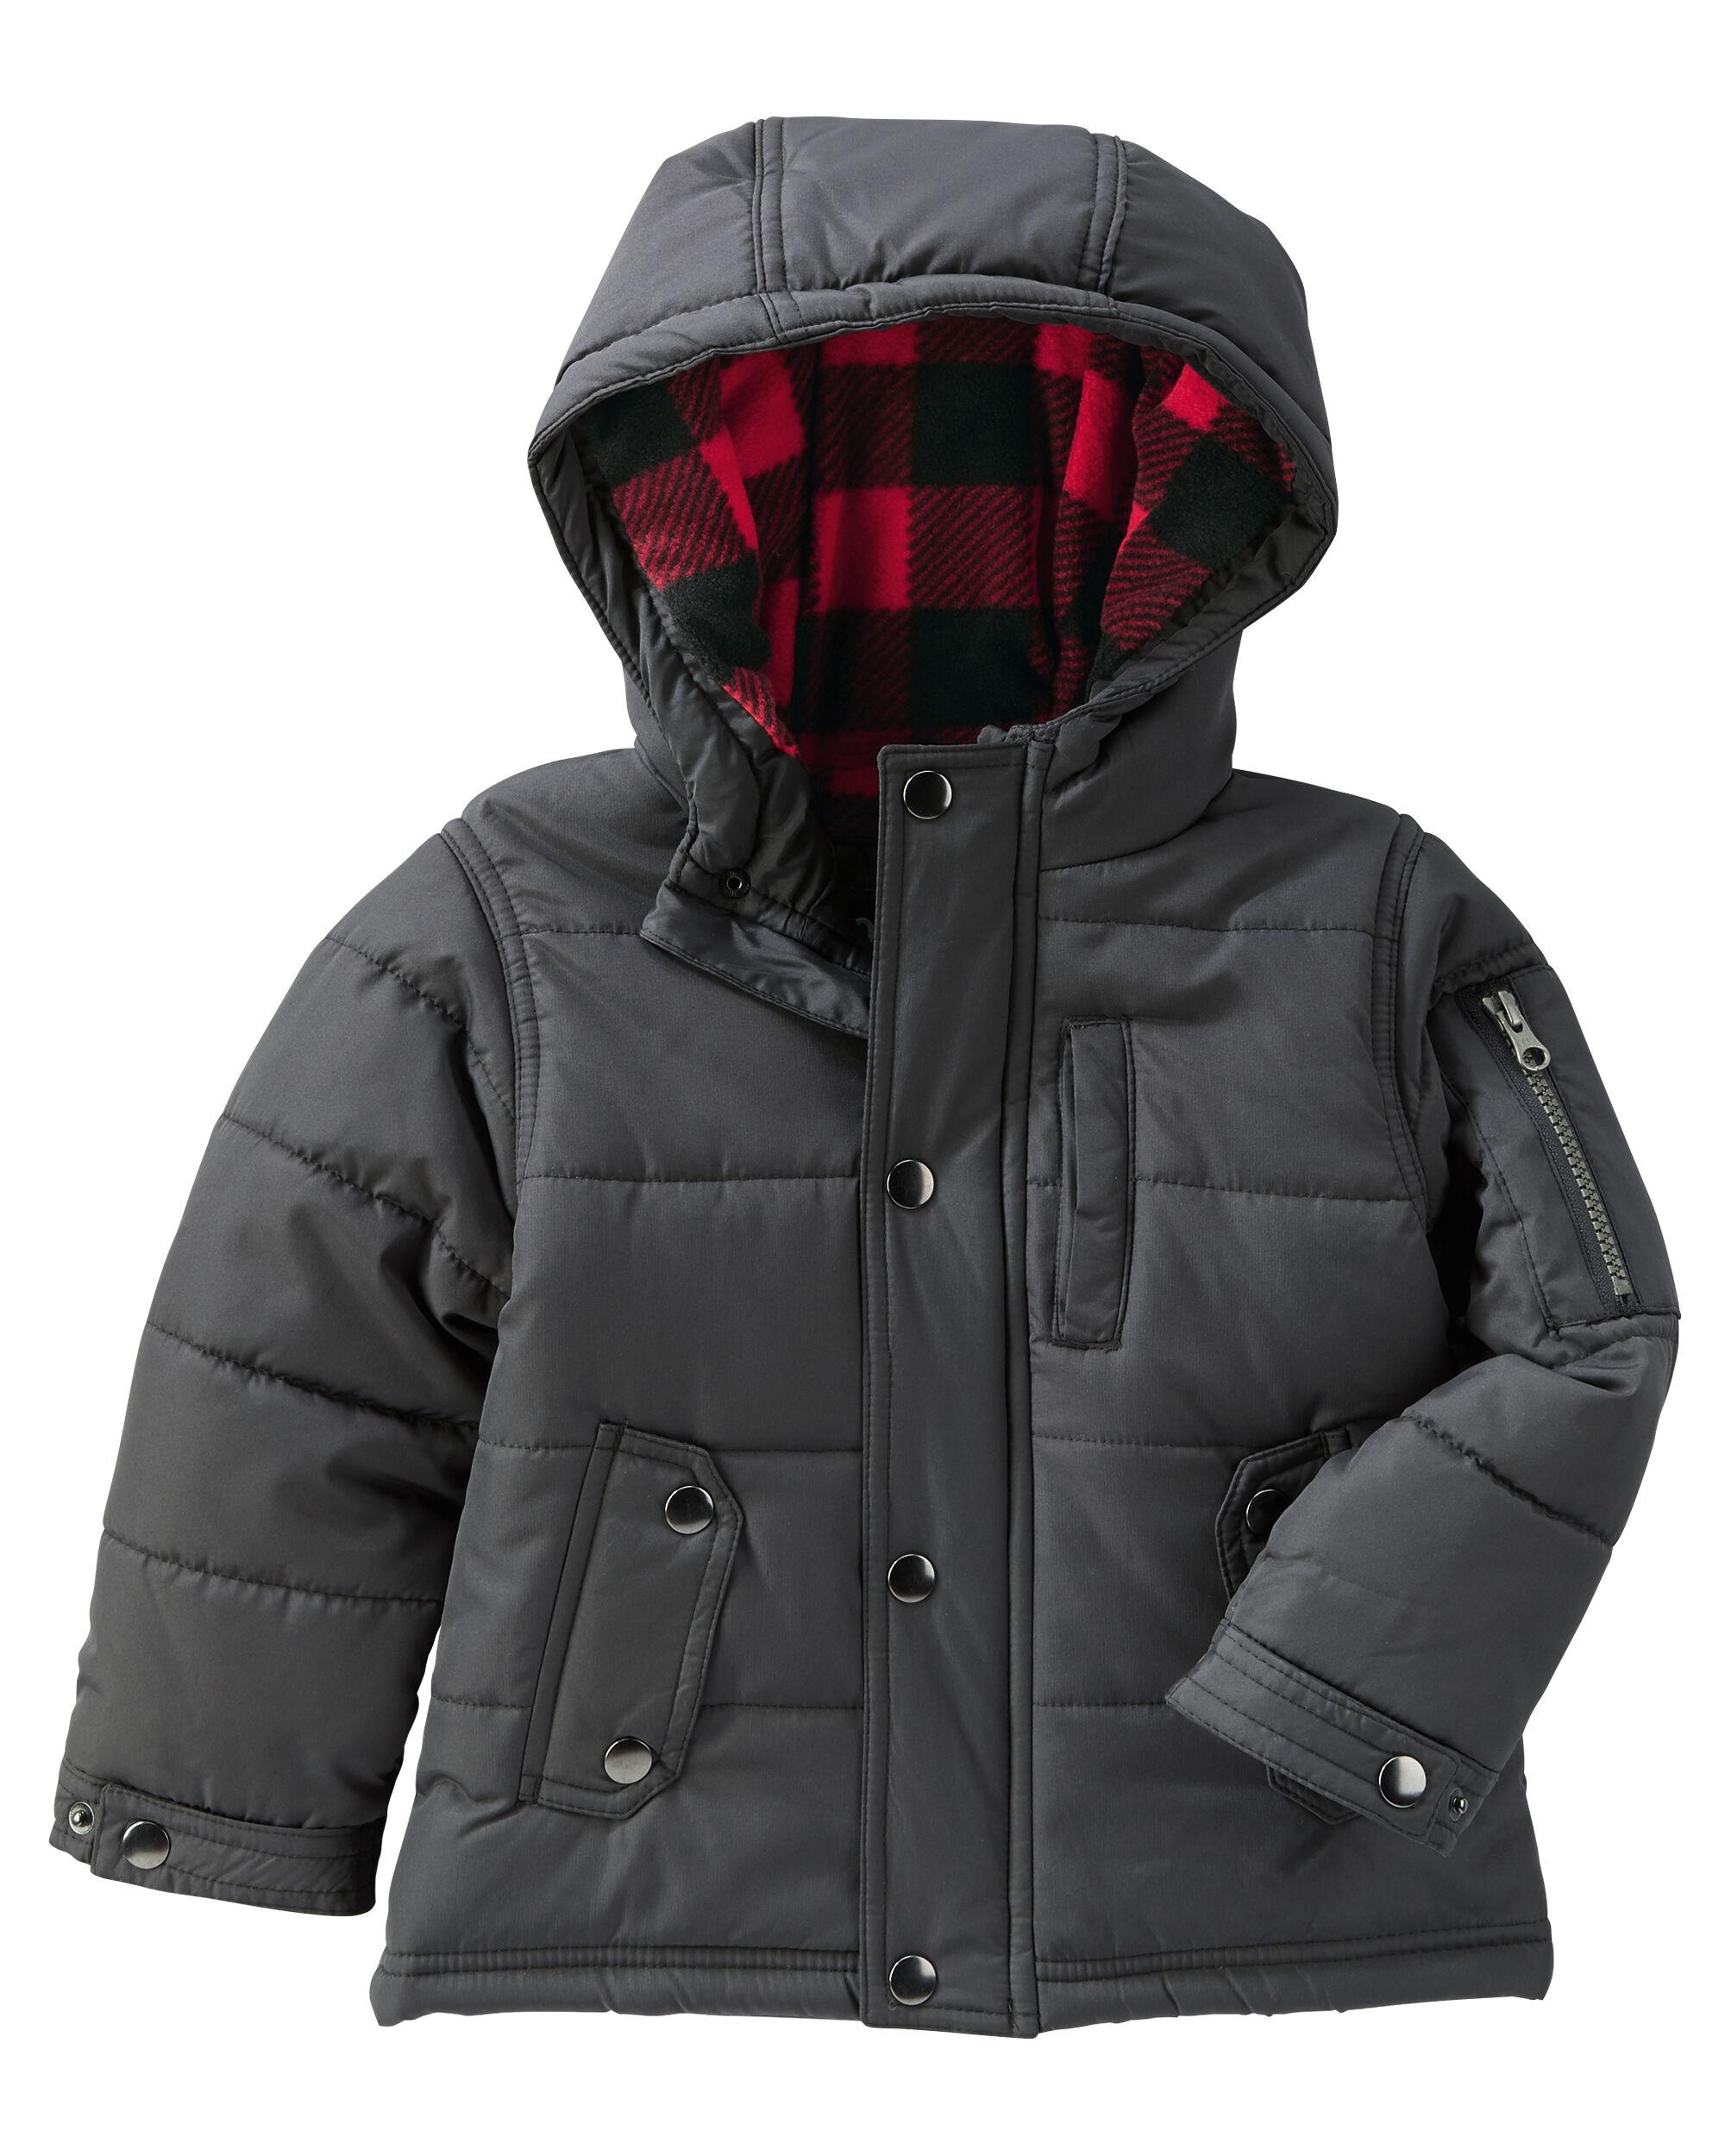 Boys Jackets, Coats & Outerwear | OshKosh | Free Shipping